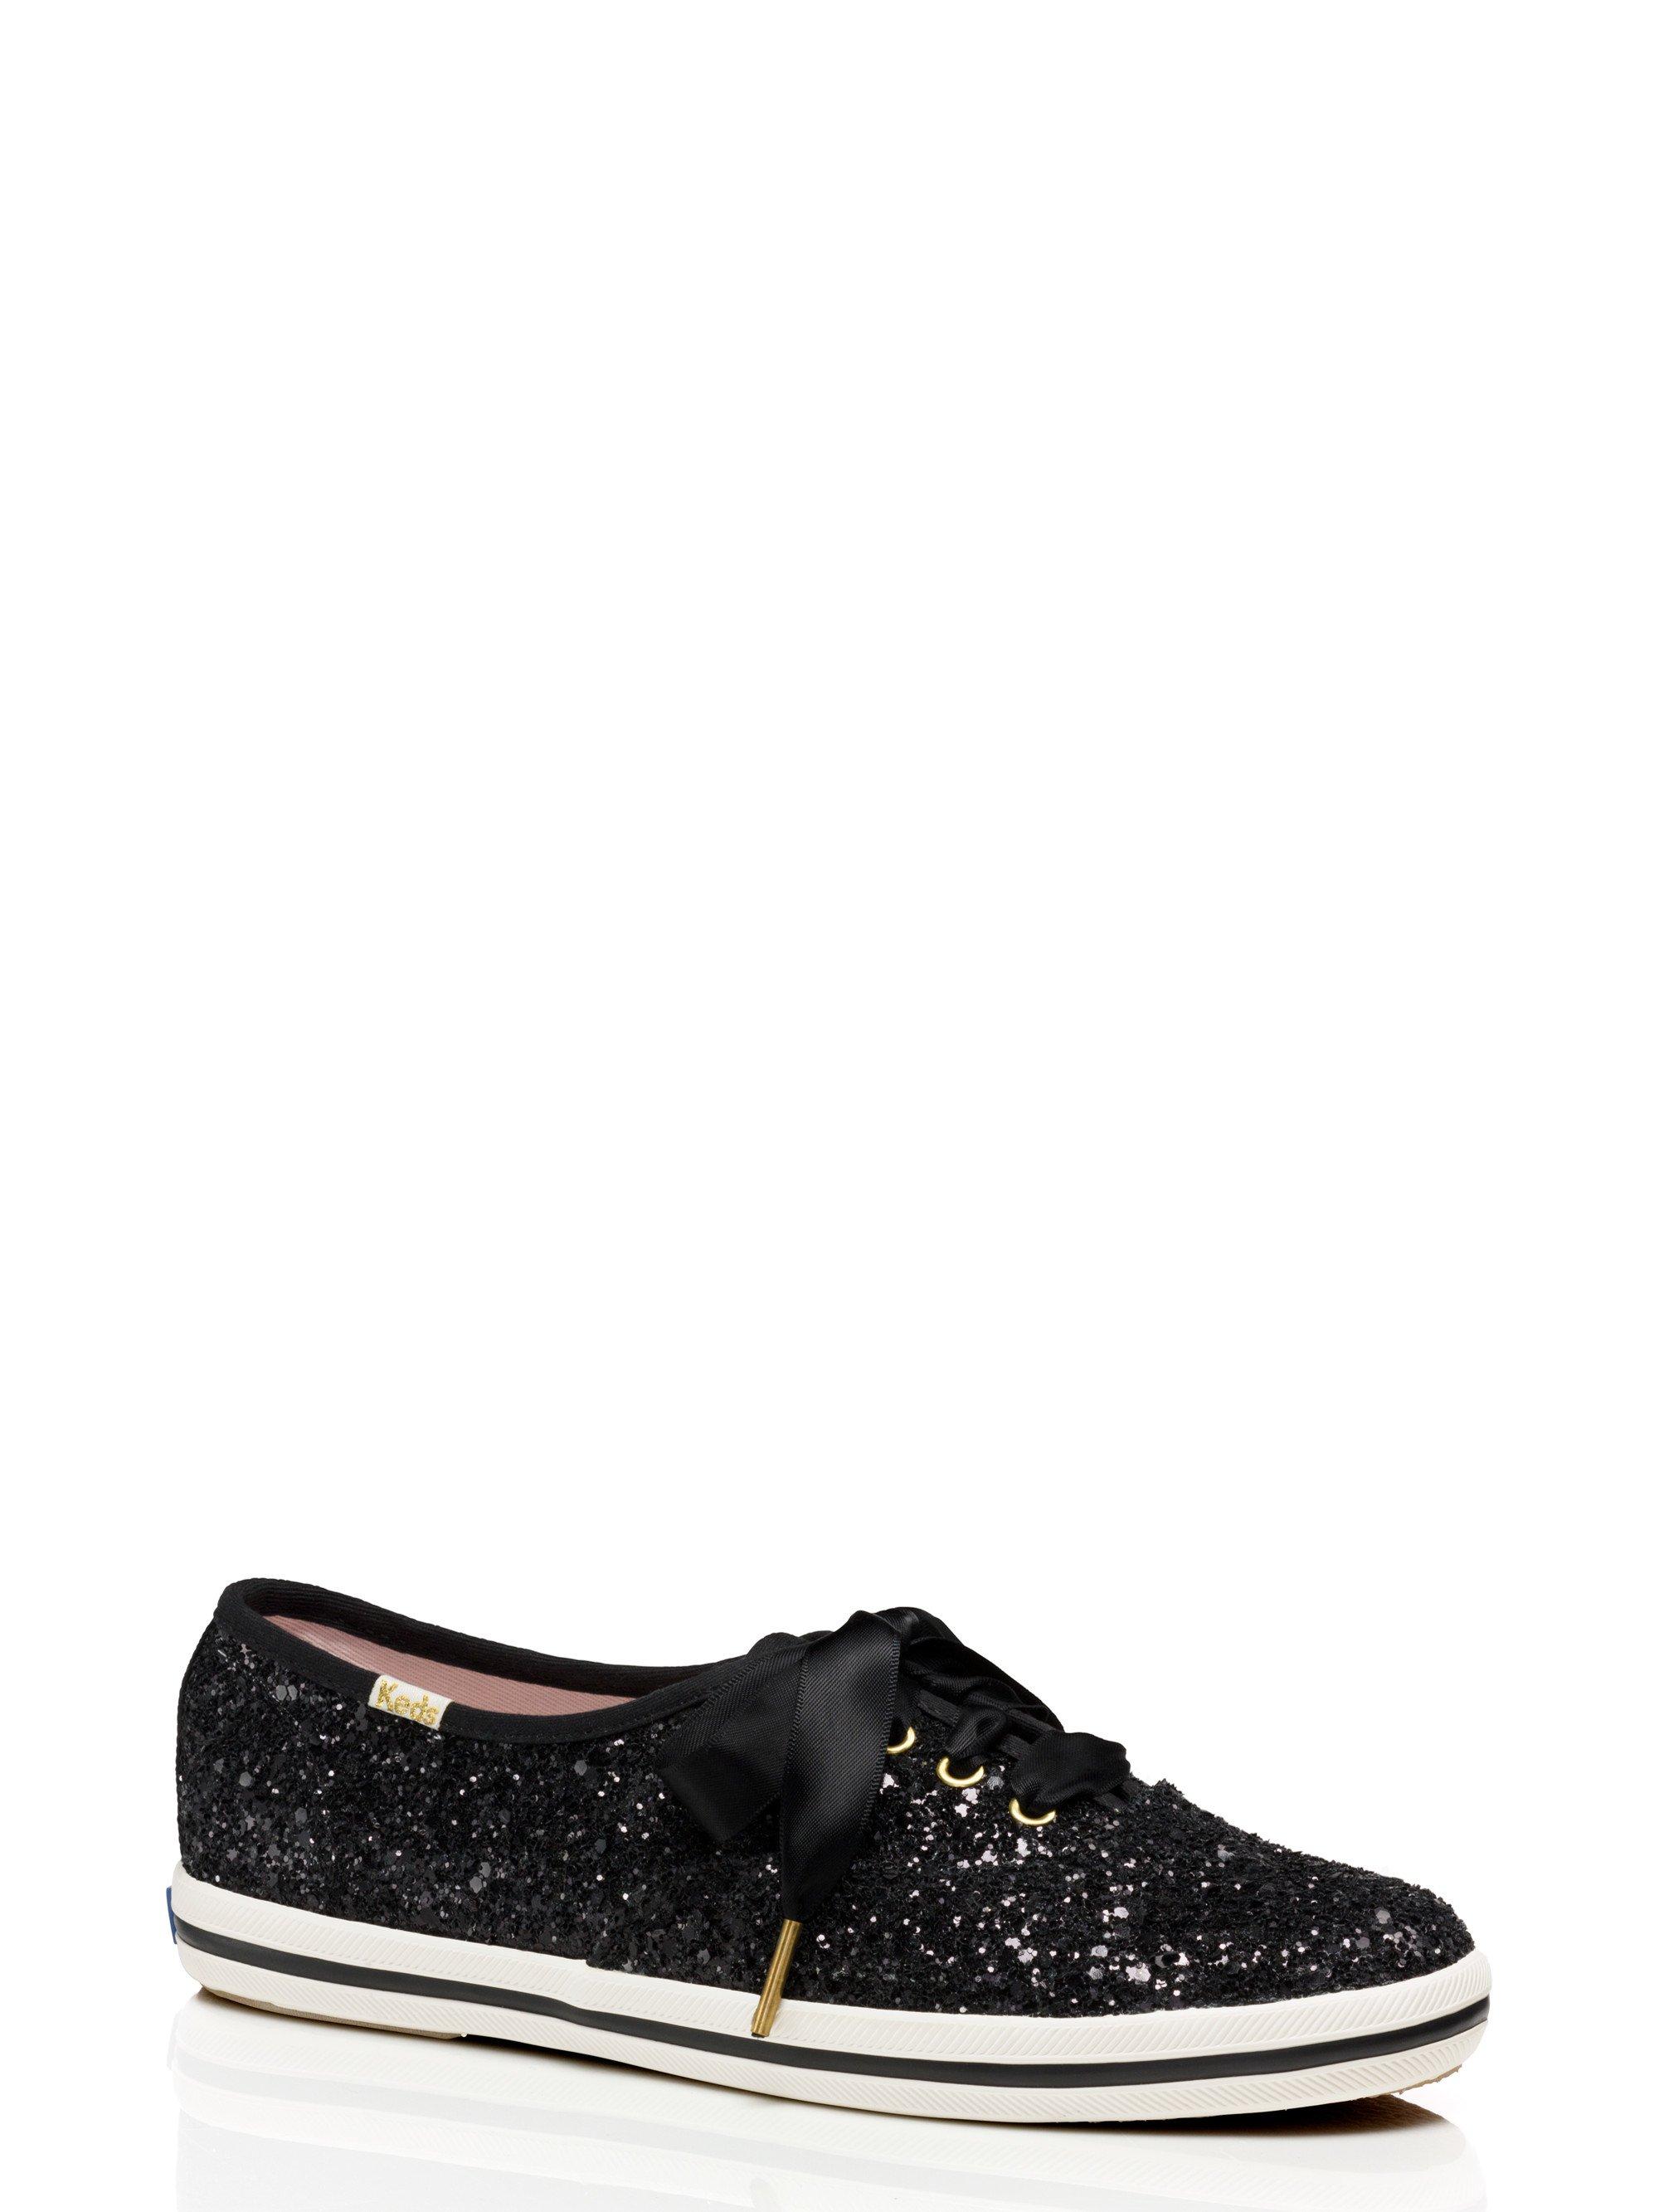 Glitter Tennis Shoes Black